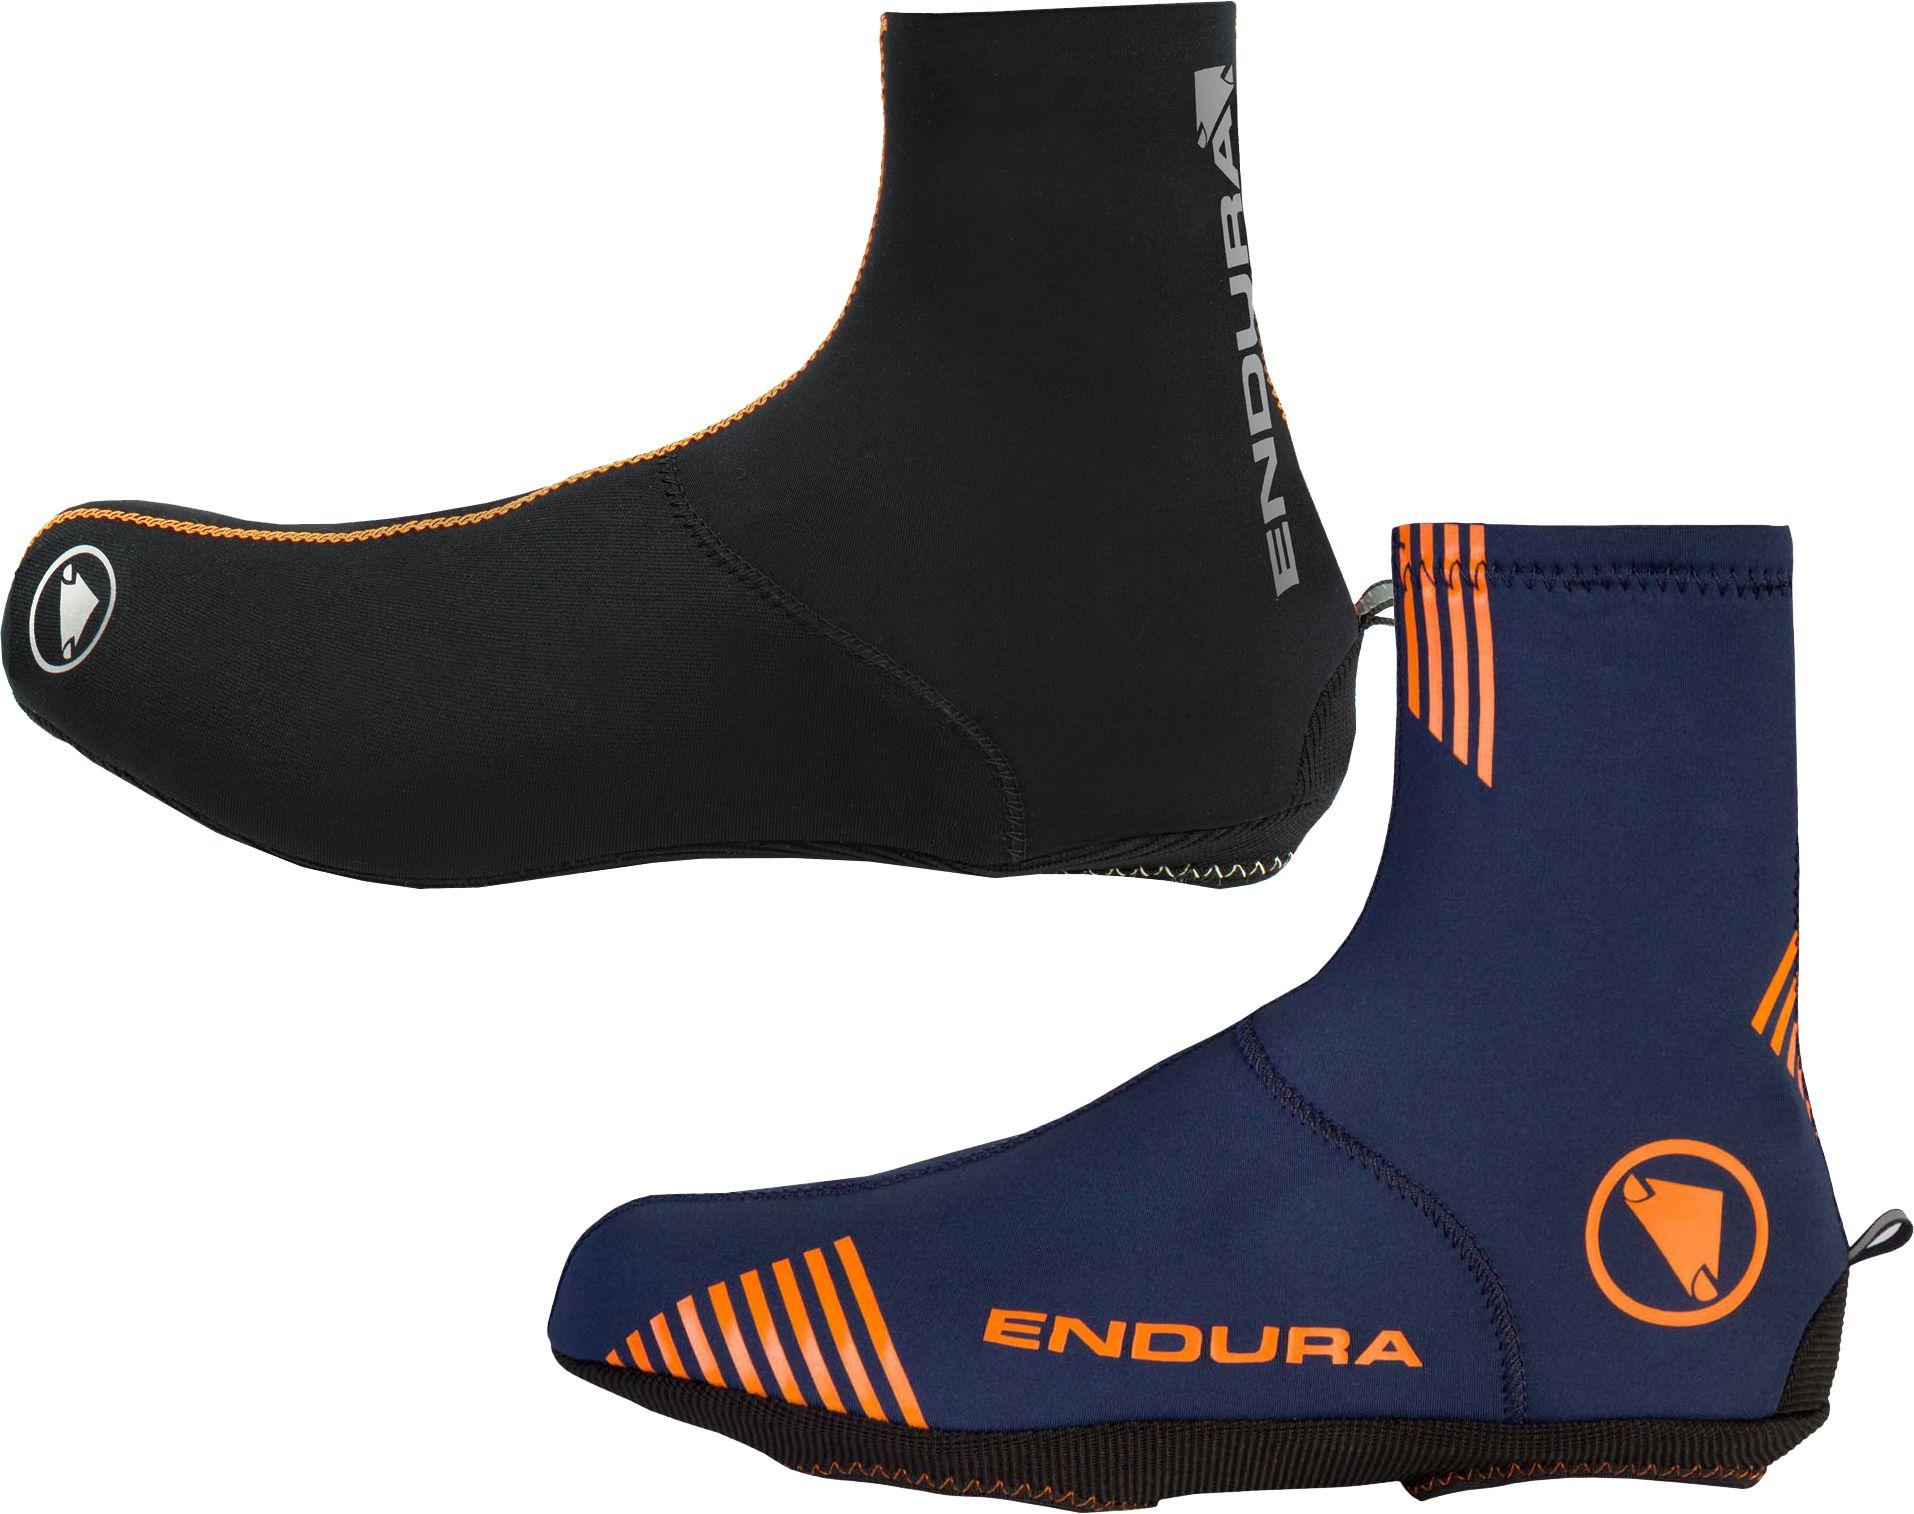 Endura Deluge Zipless Overshoes Waterproof Neoprene   Shoe Covers